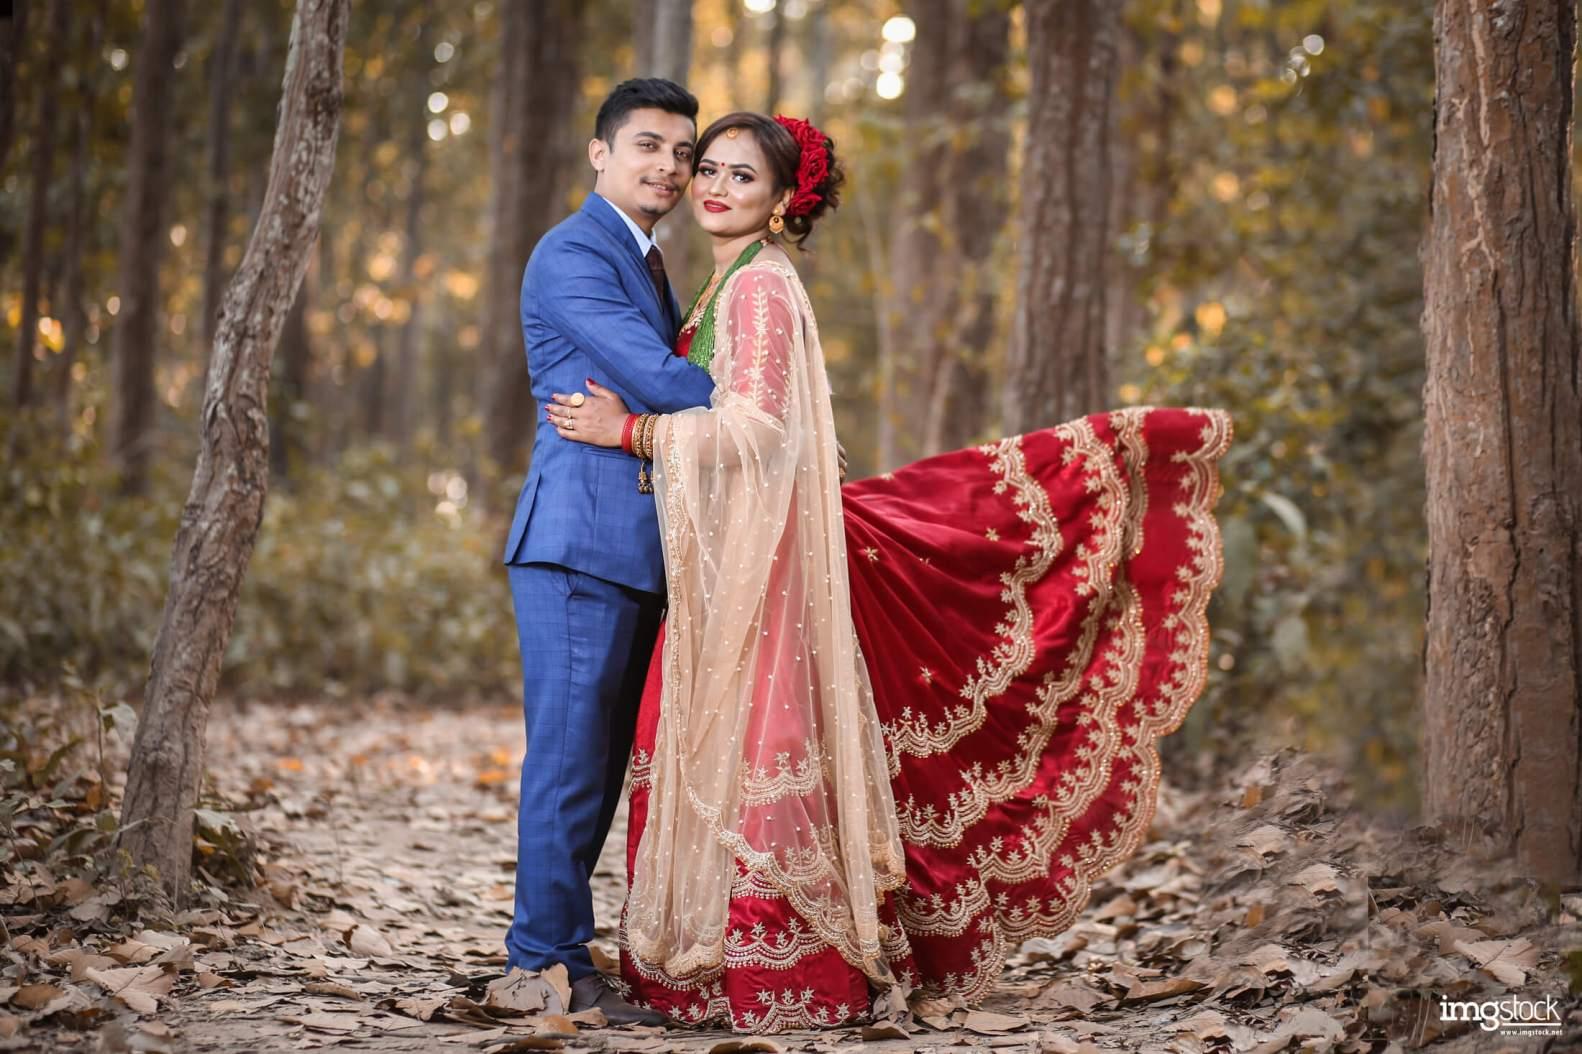 Tulasha Photoshoot - Wedding Photoshoot, Imgstock